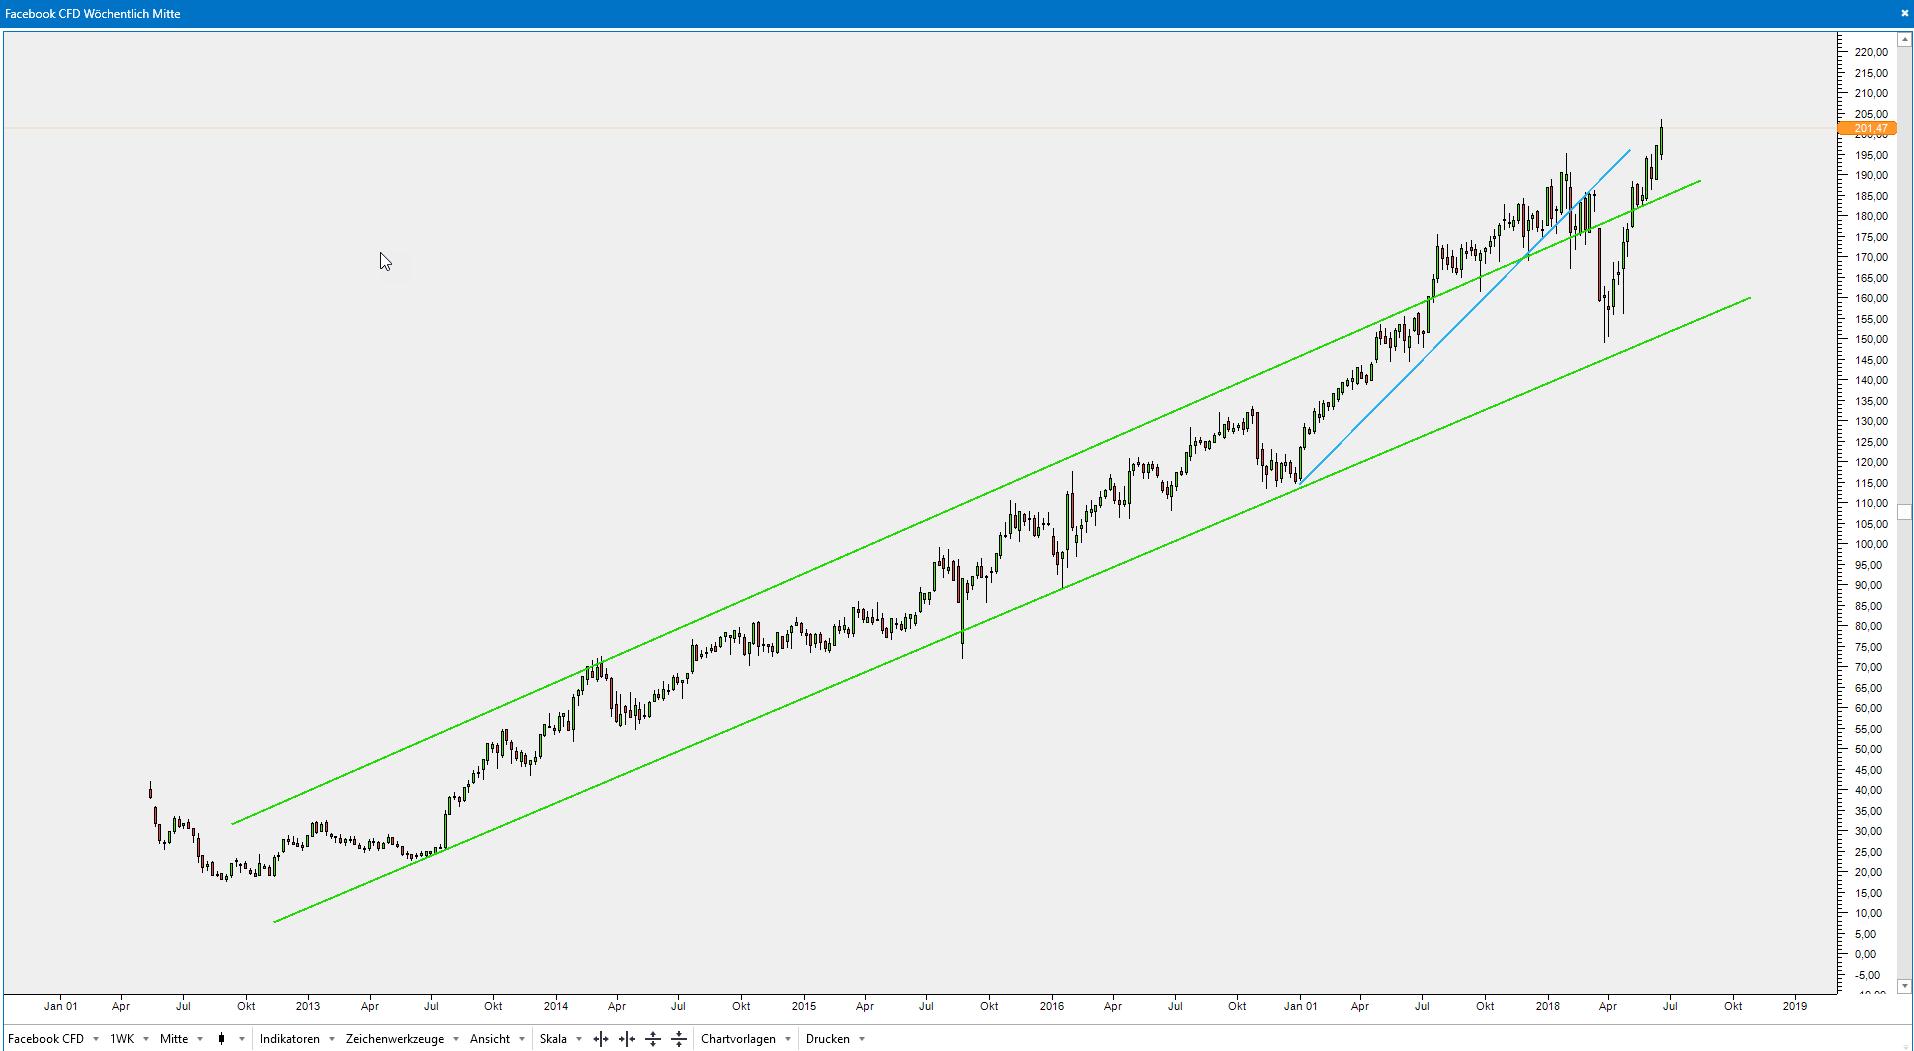 Facebook Aktie CFD Chart Trend